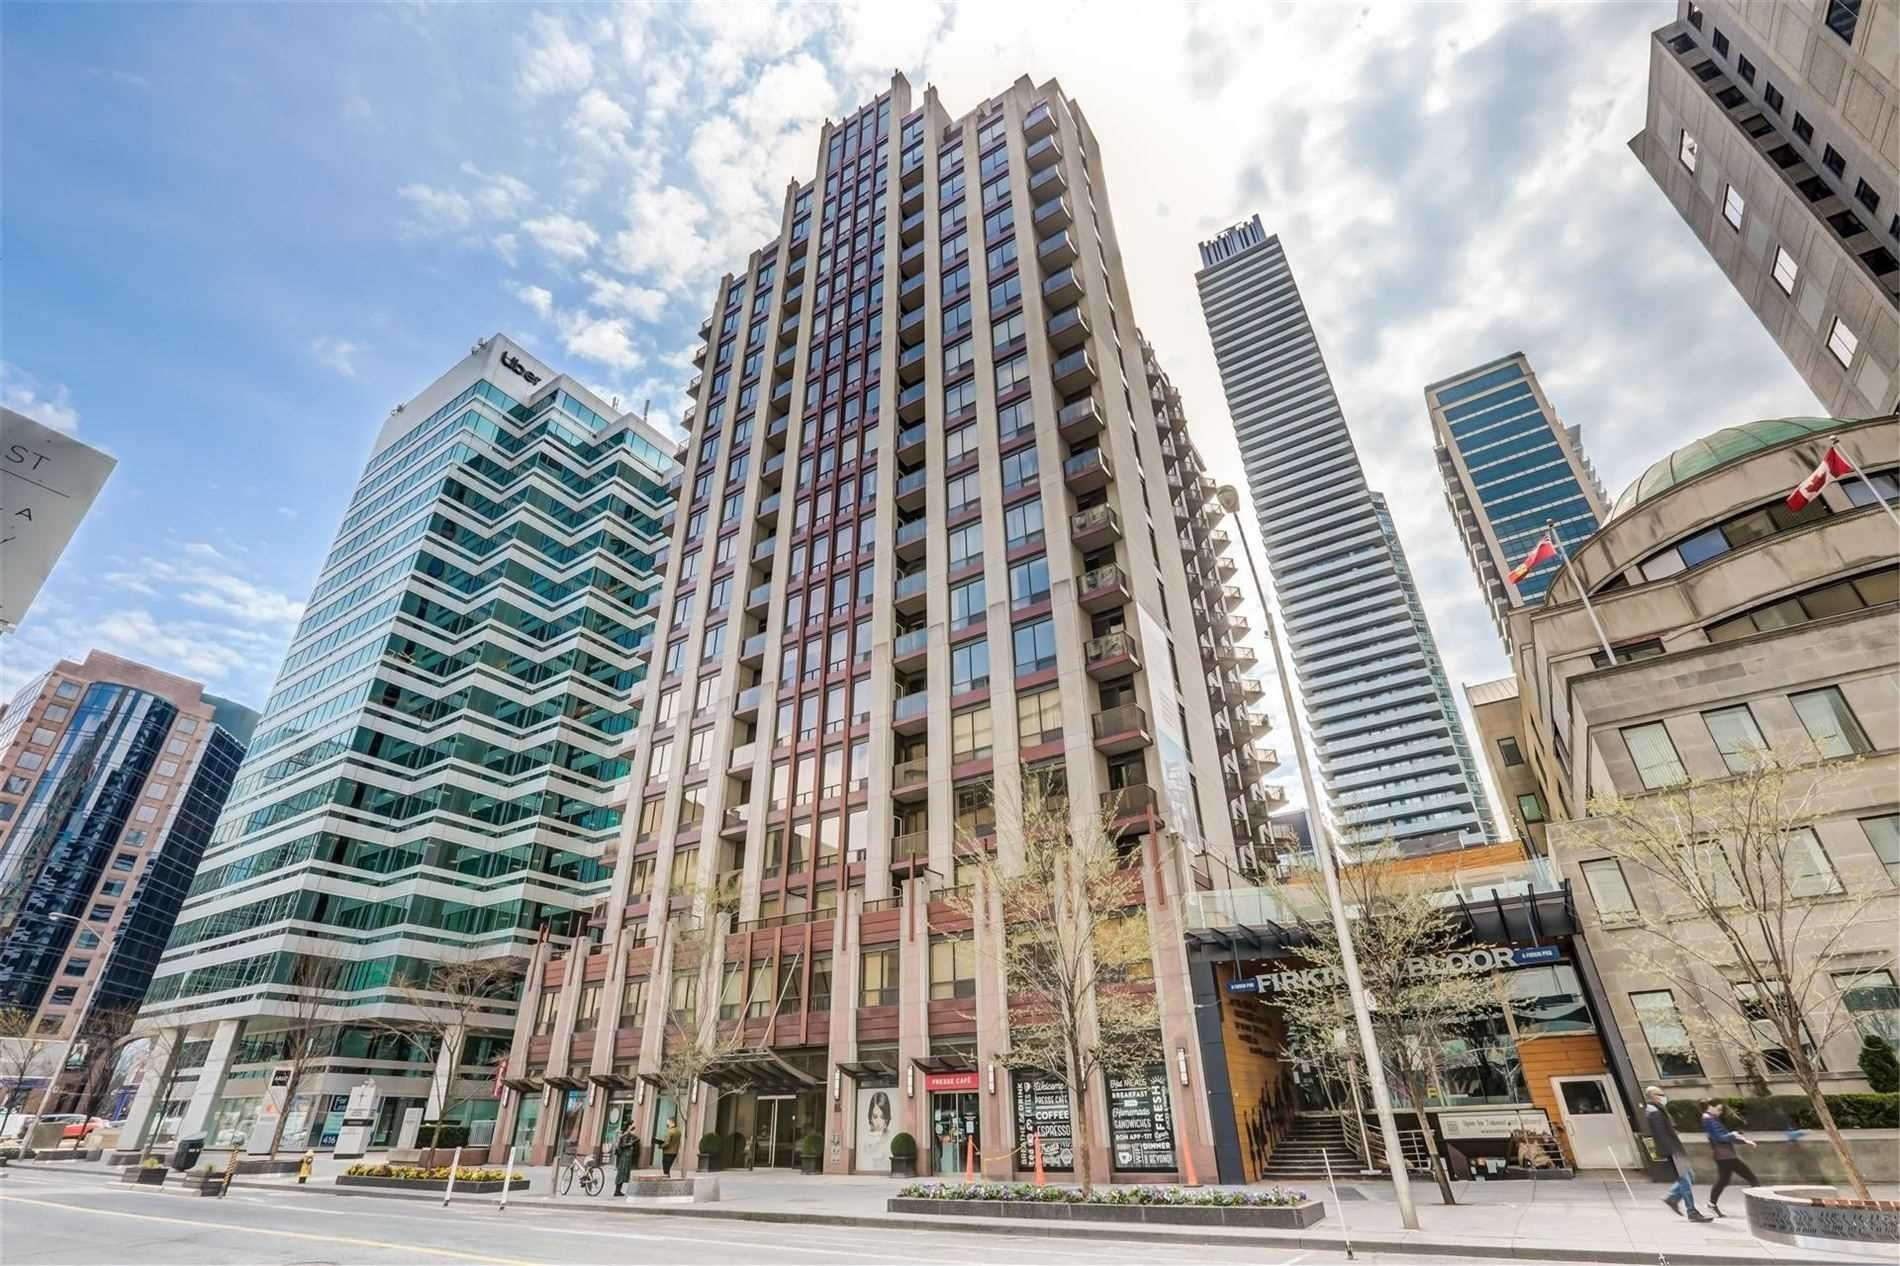 Main Photo: 402 85 E Bloor Street in Toronto: Church-Yonge Corridor Condo for sale (Toronto C08)  : MLS®# C5335553